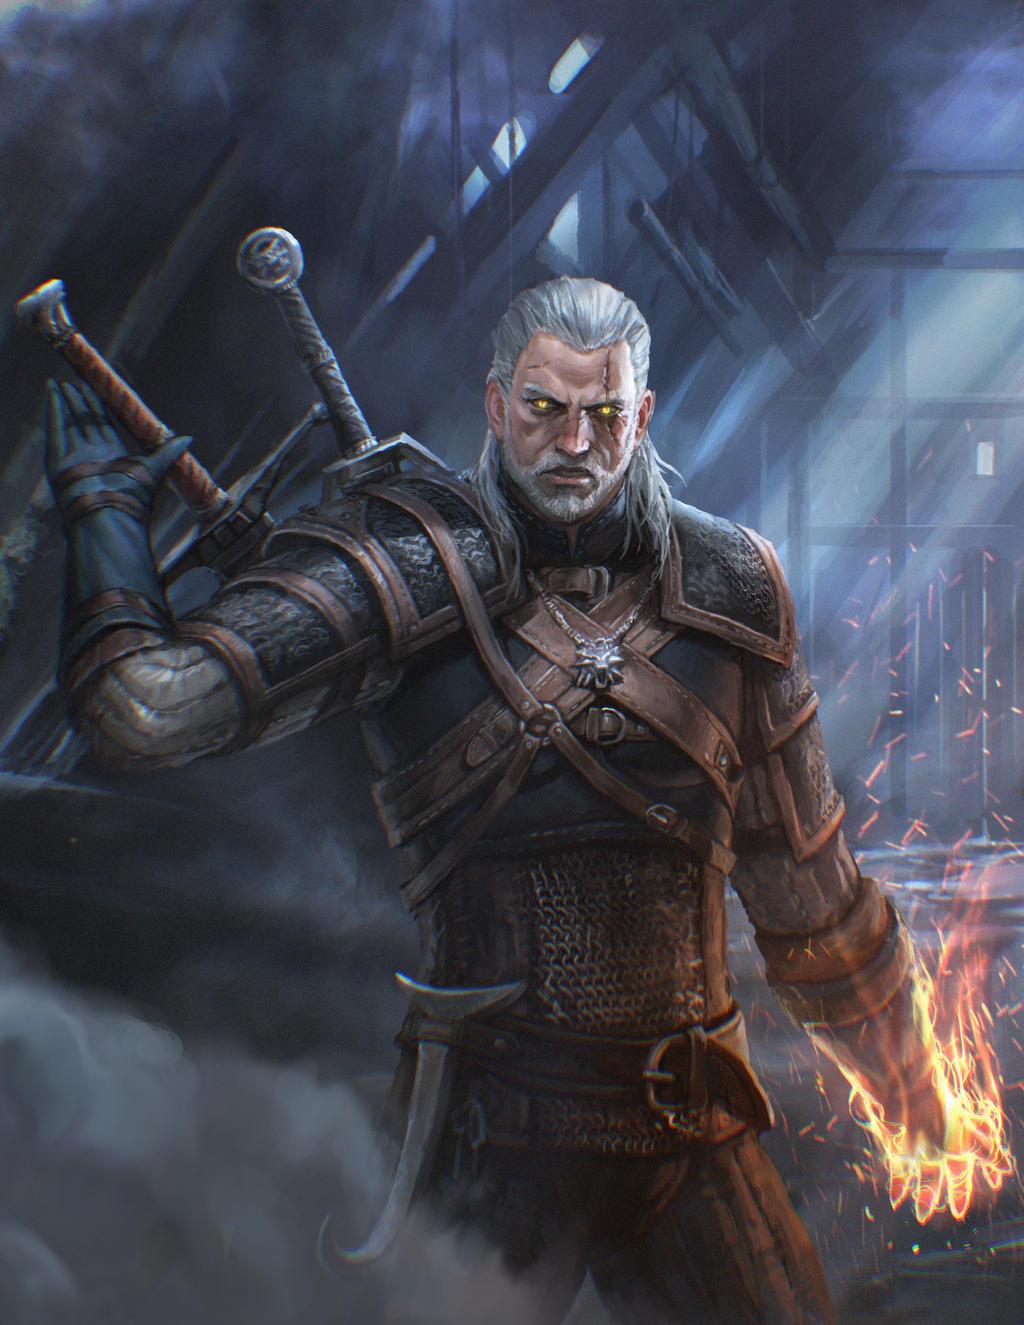 Geralt The Witcher Fanart By Inshoo1 On Deviantart